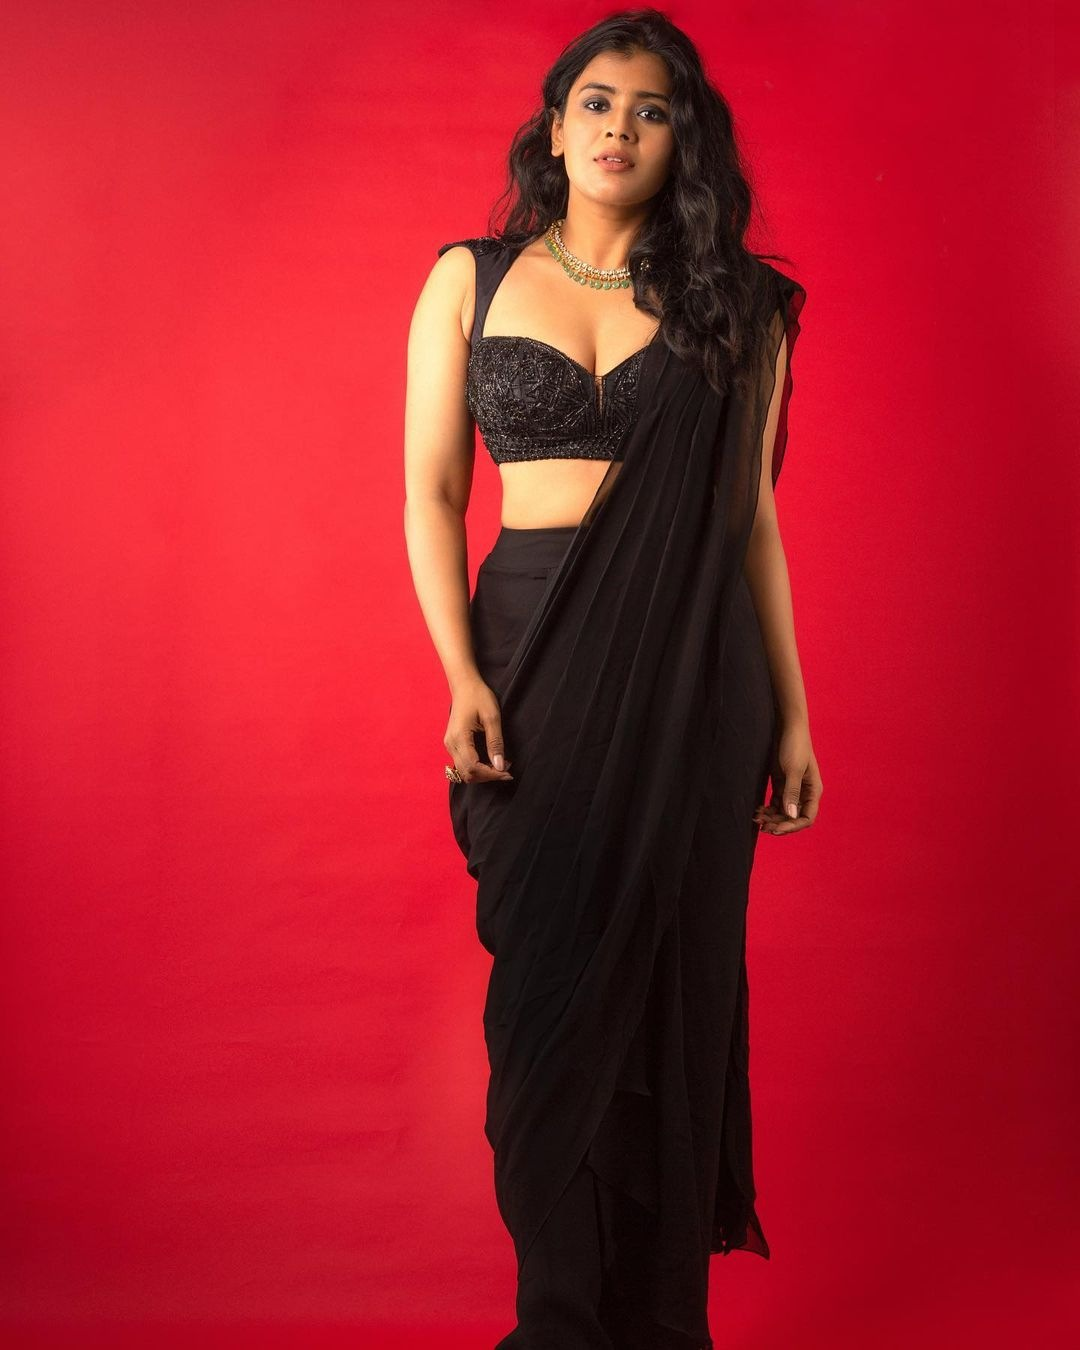 Priya Mani in pink saree by dithya sai fashions for dhee kings-3